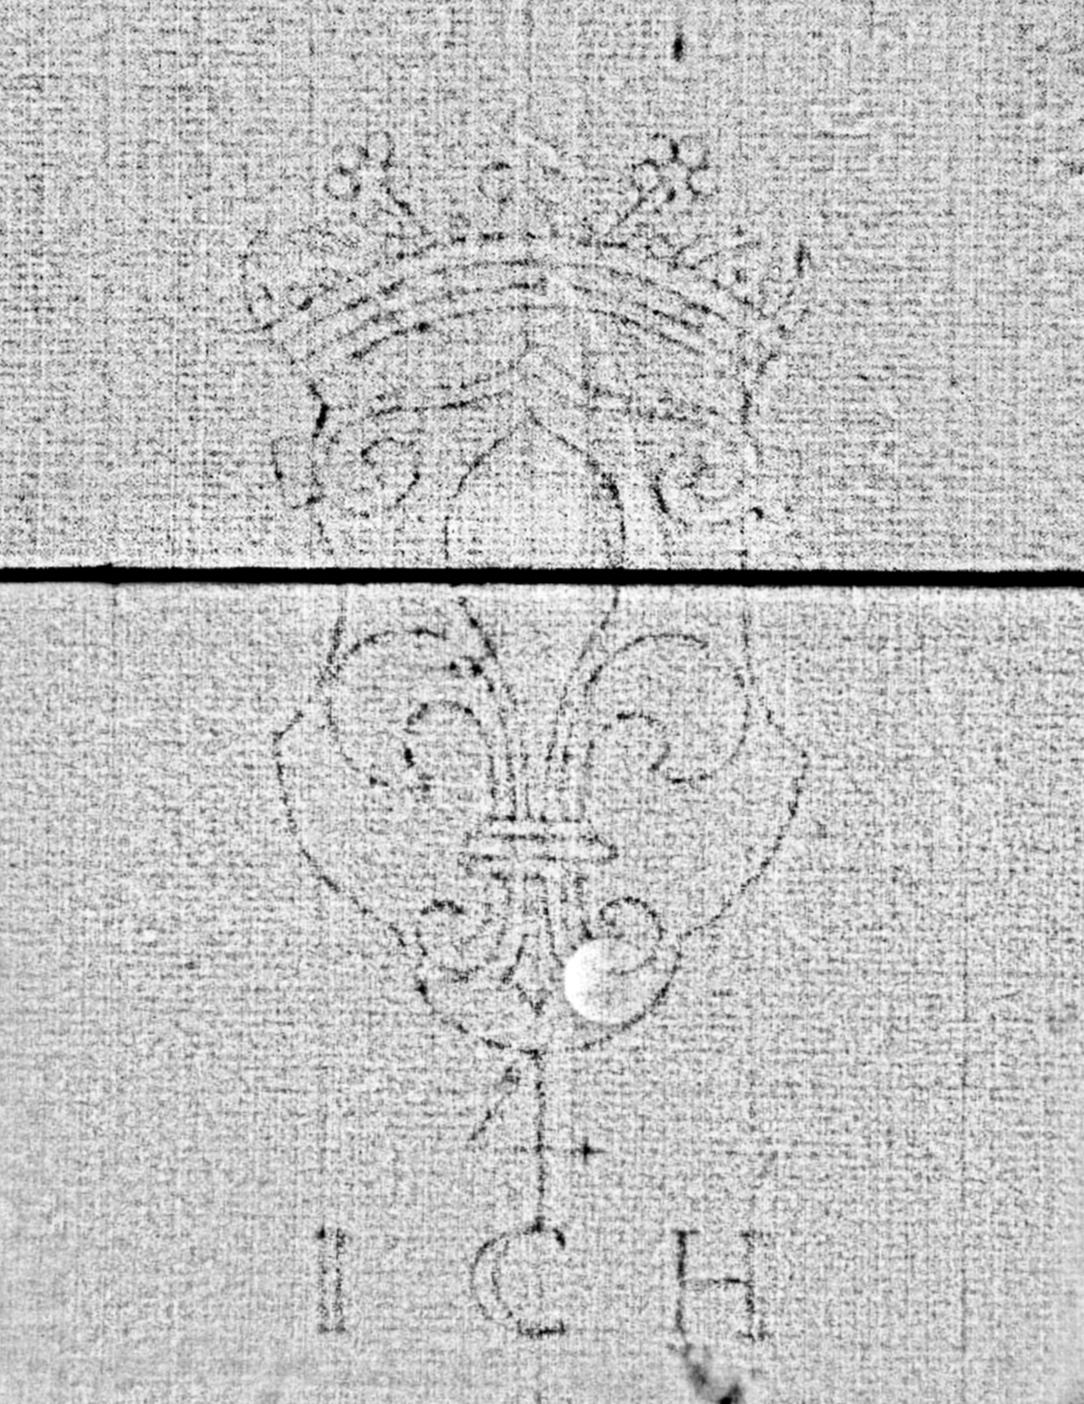 Bach digital: Lilie in bekröntem Schild, ICH / KB (1)